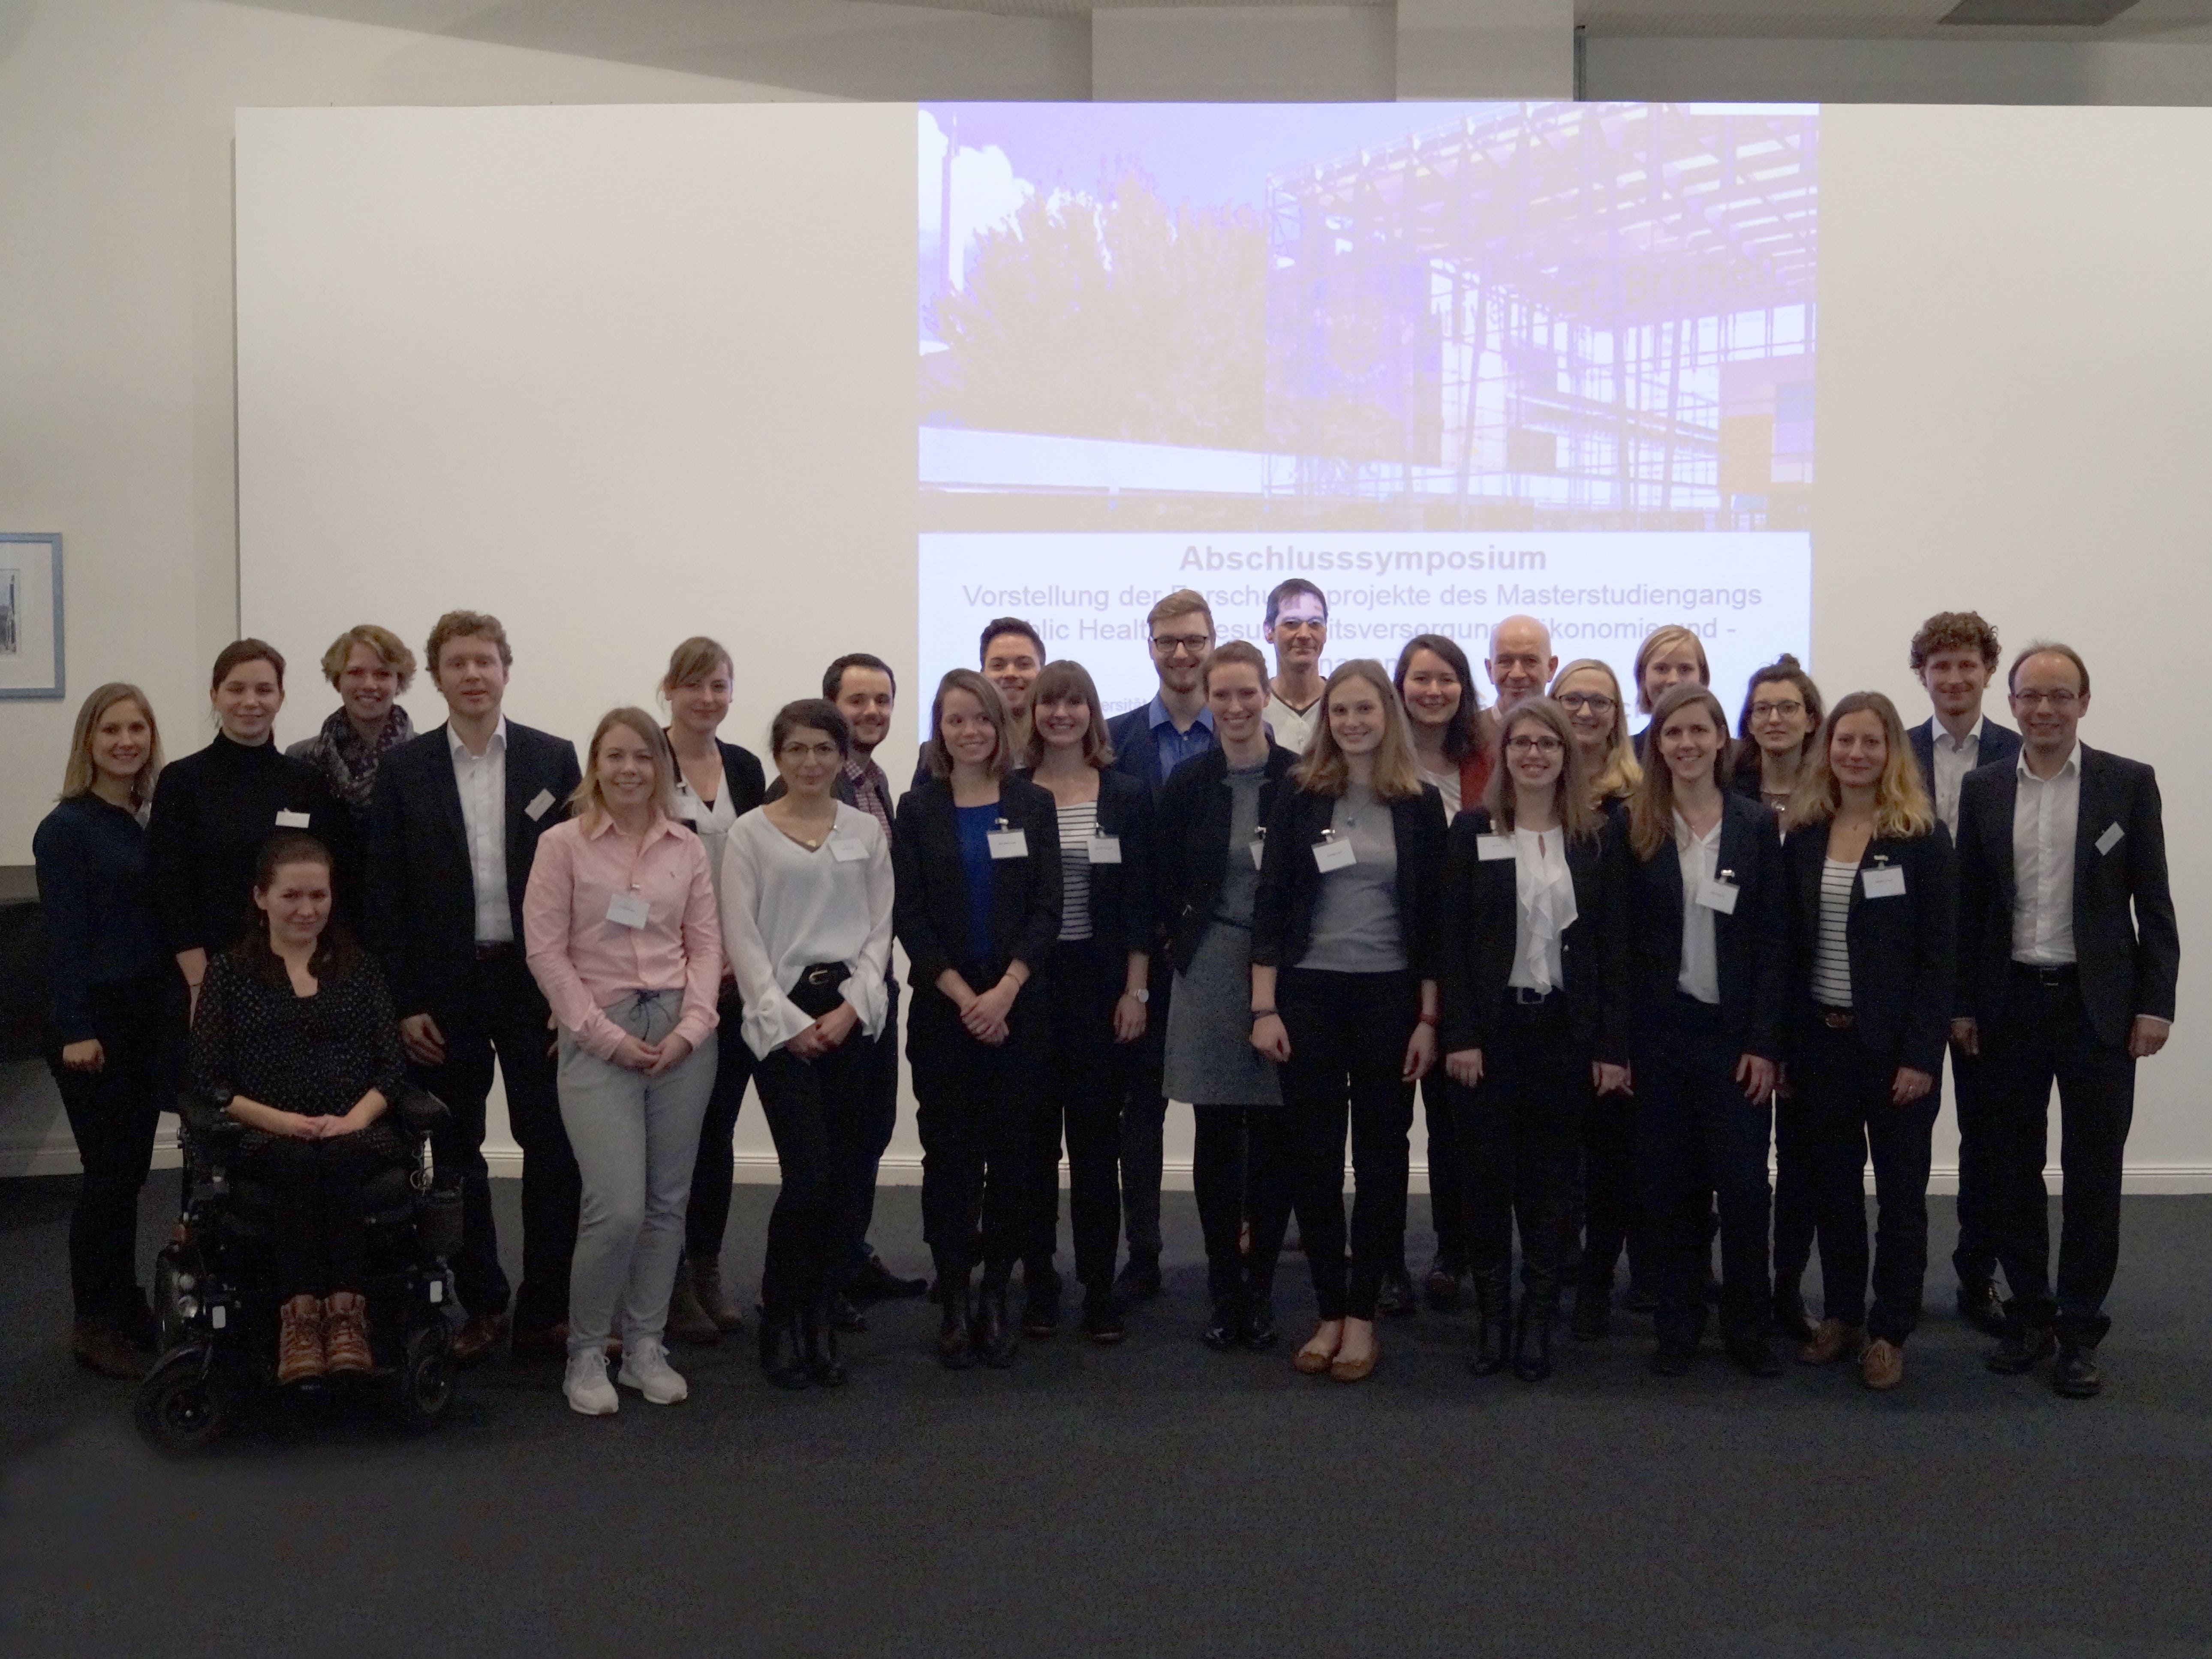 ansgar gerhardusuniversitt bremen - Uni Bremen Online Bewerbung